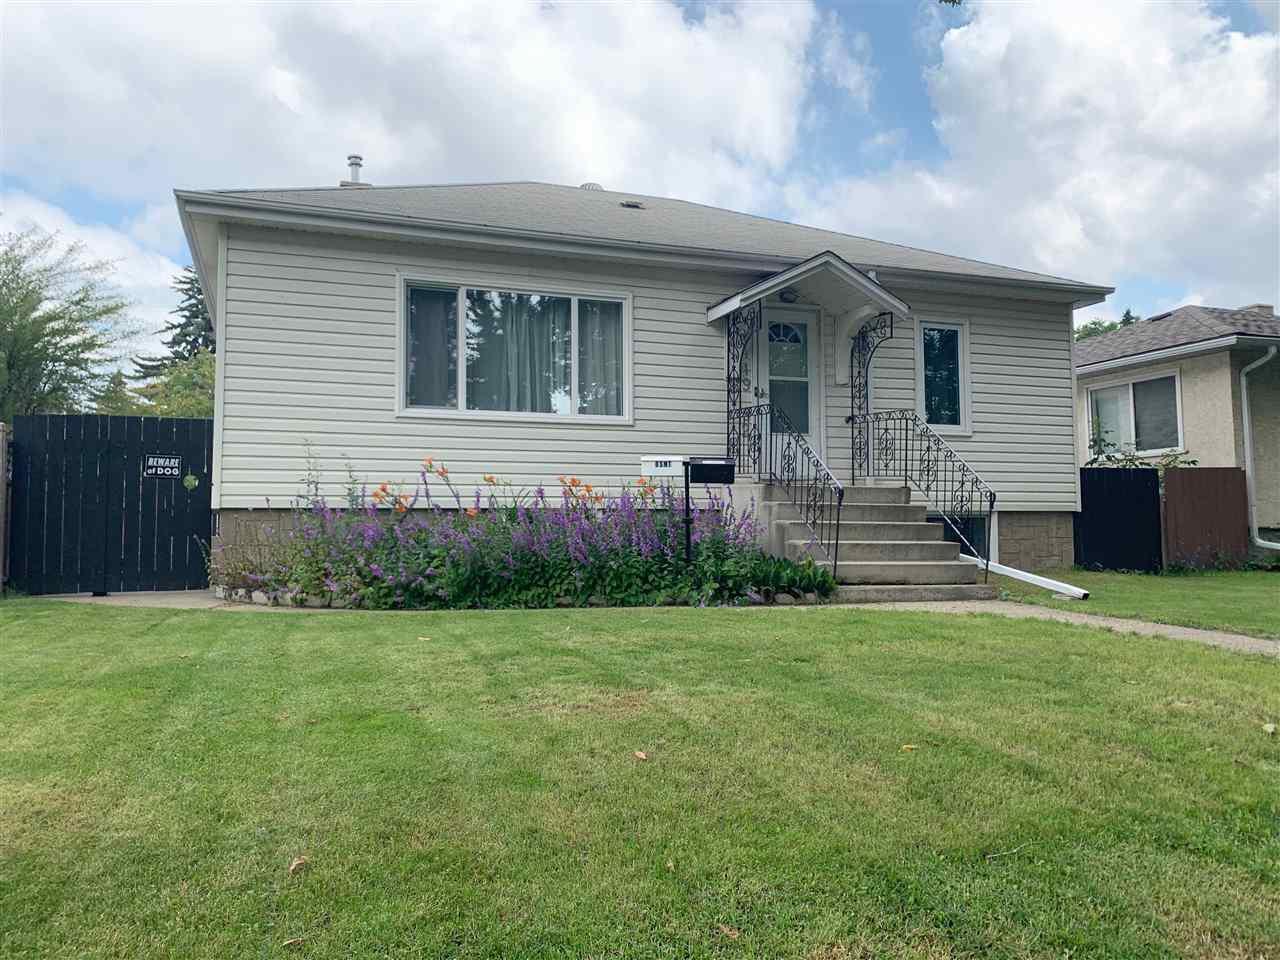 Main Photo: 12419 92 Street in Edmonton: Zone 05 House for sale : MLS®# E4179067